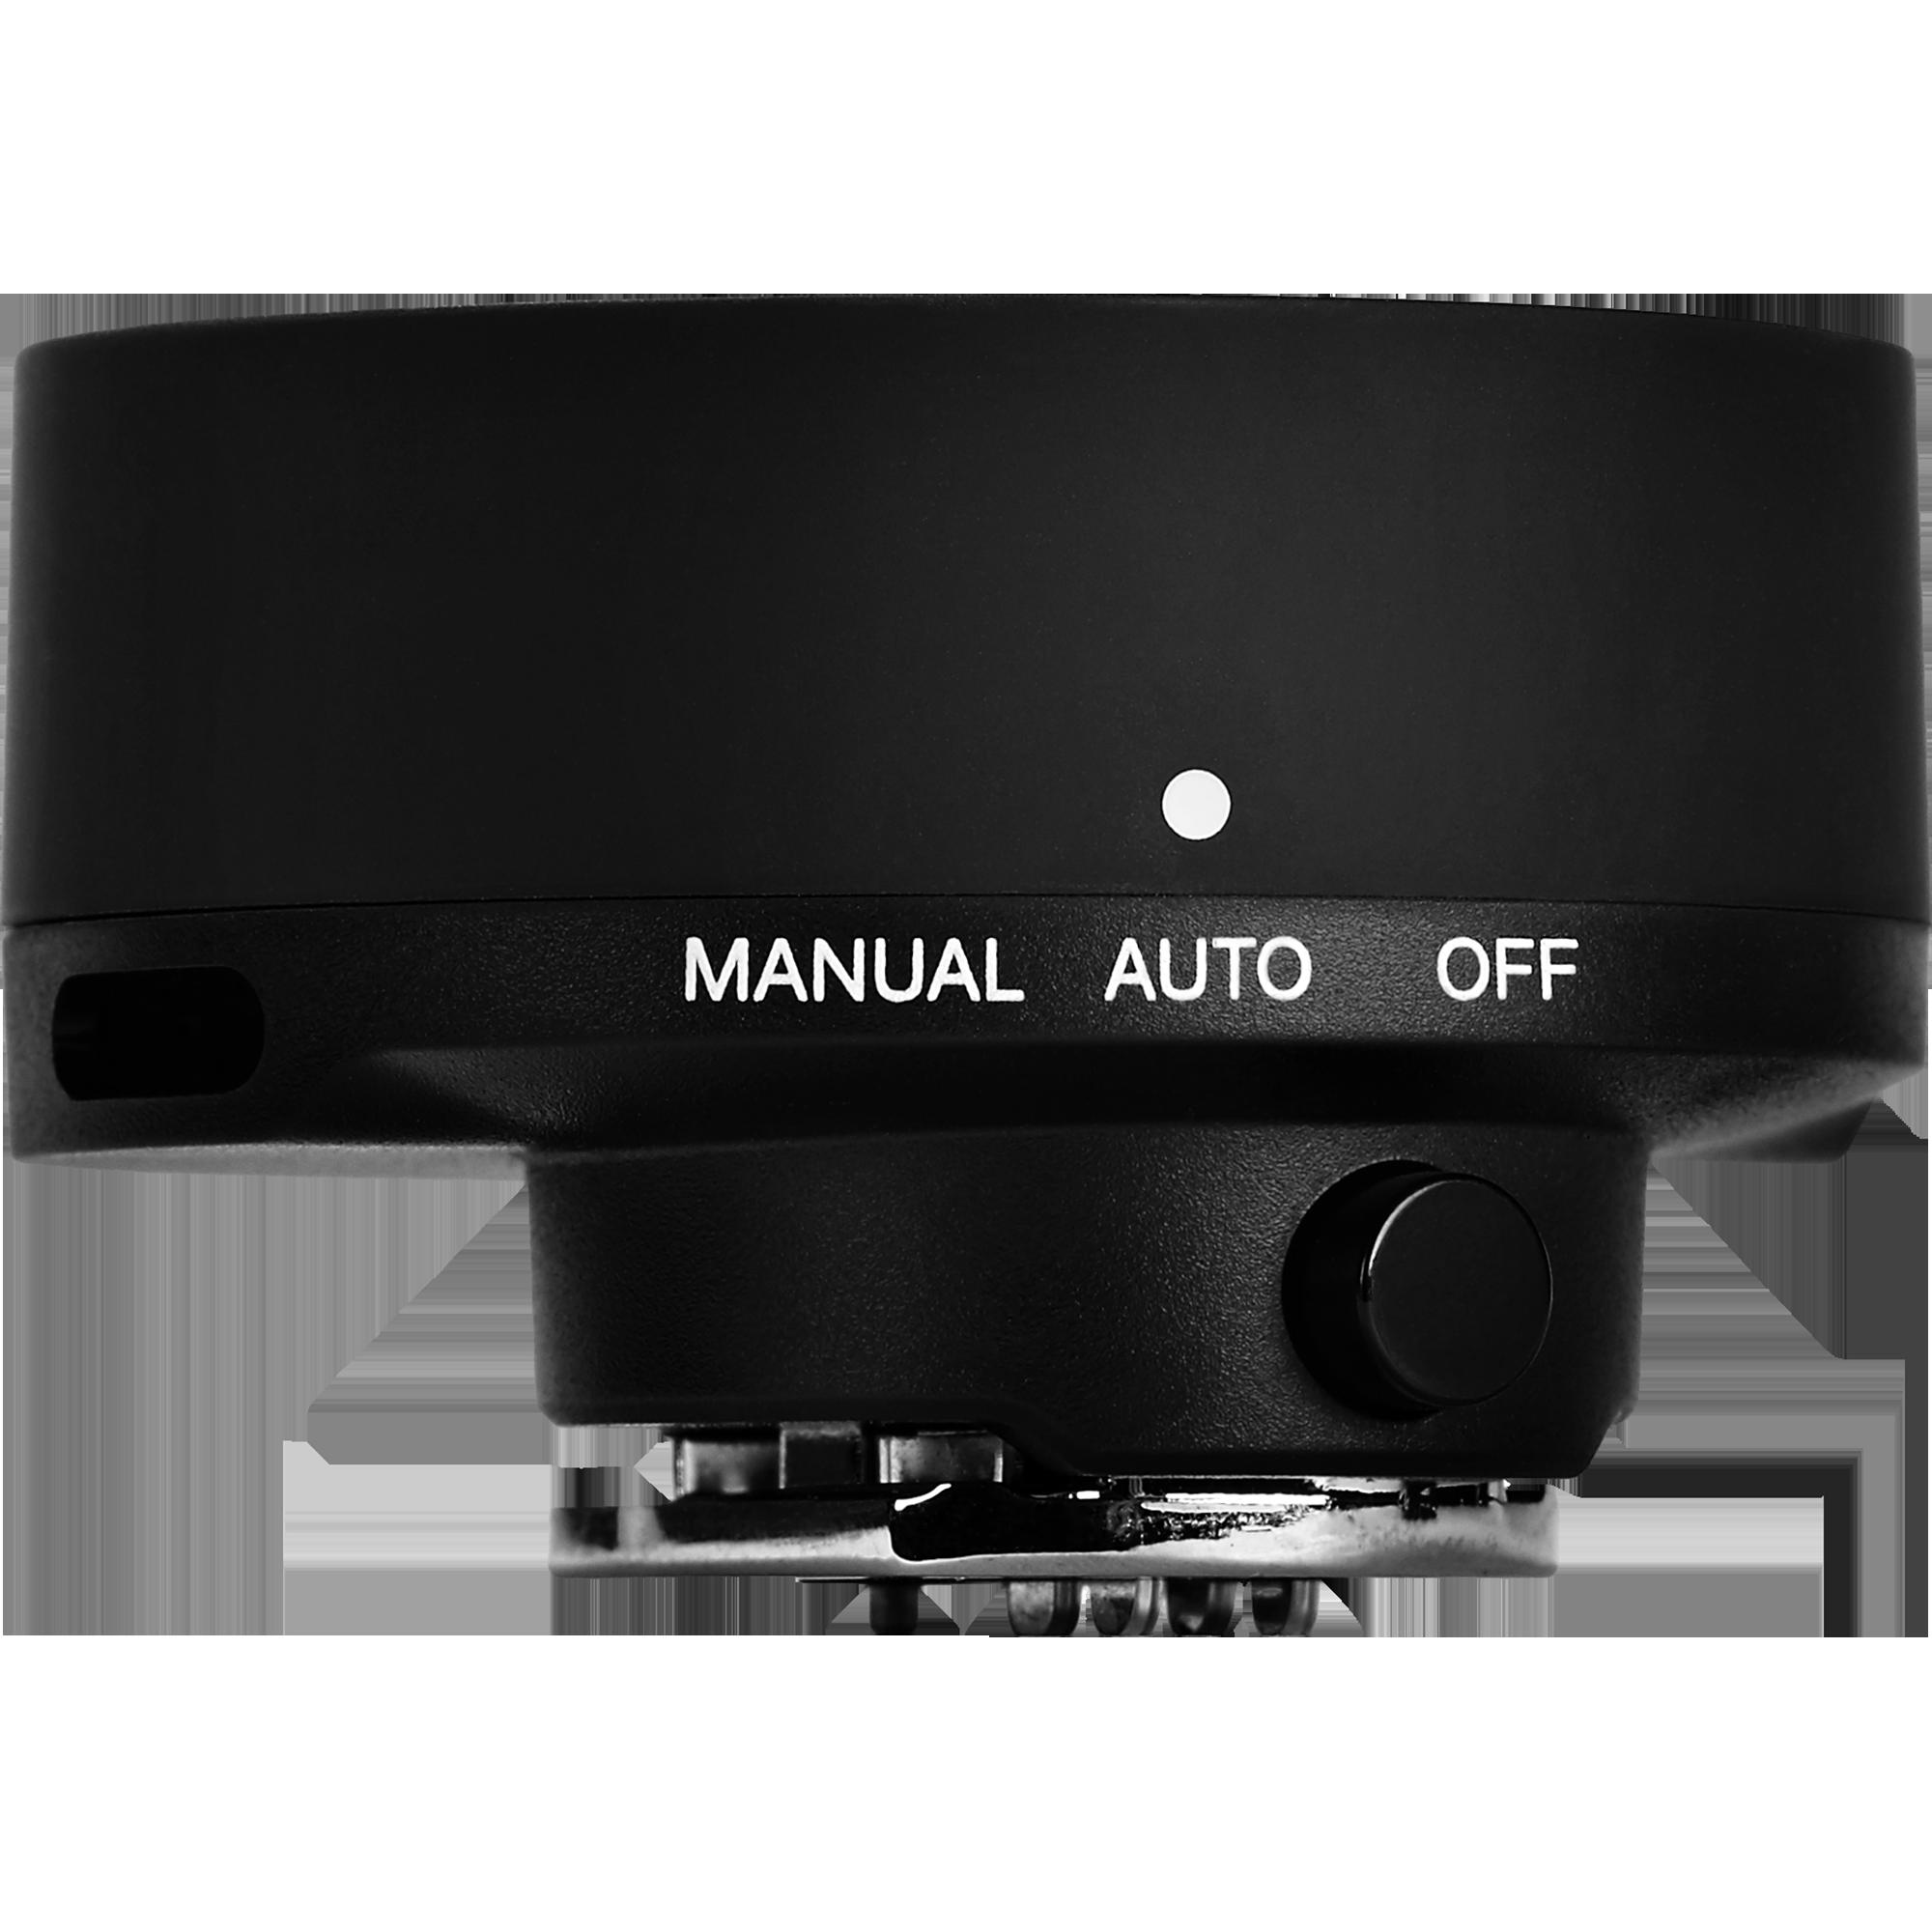 Modfine Practical USB Interface Brightness Adjustable Fill Light Beauty Lamp